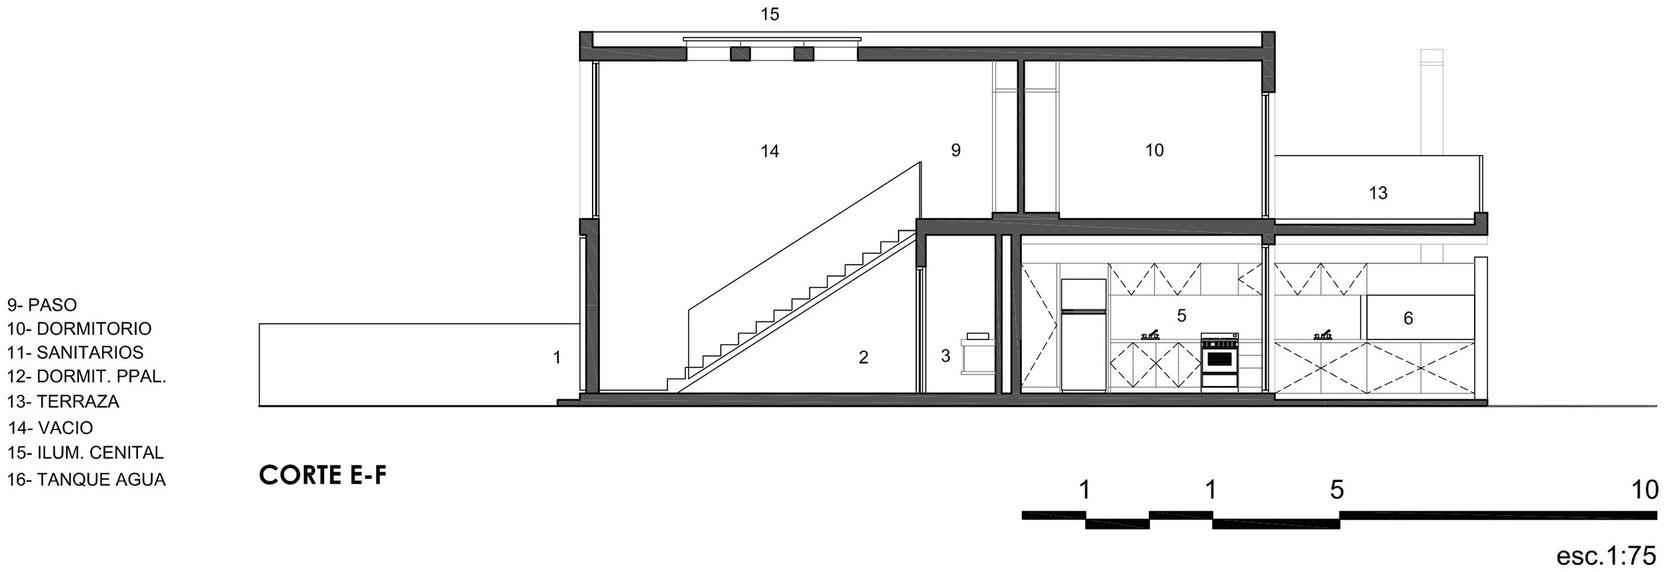 Terraced Houses-Estudio A+3-21